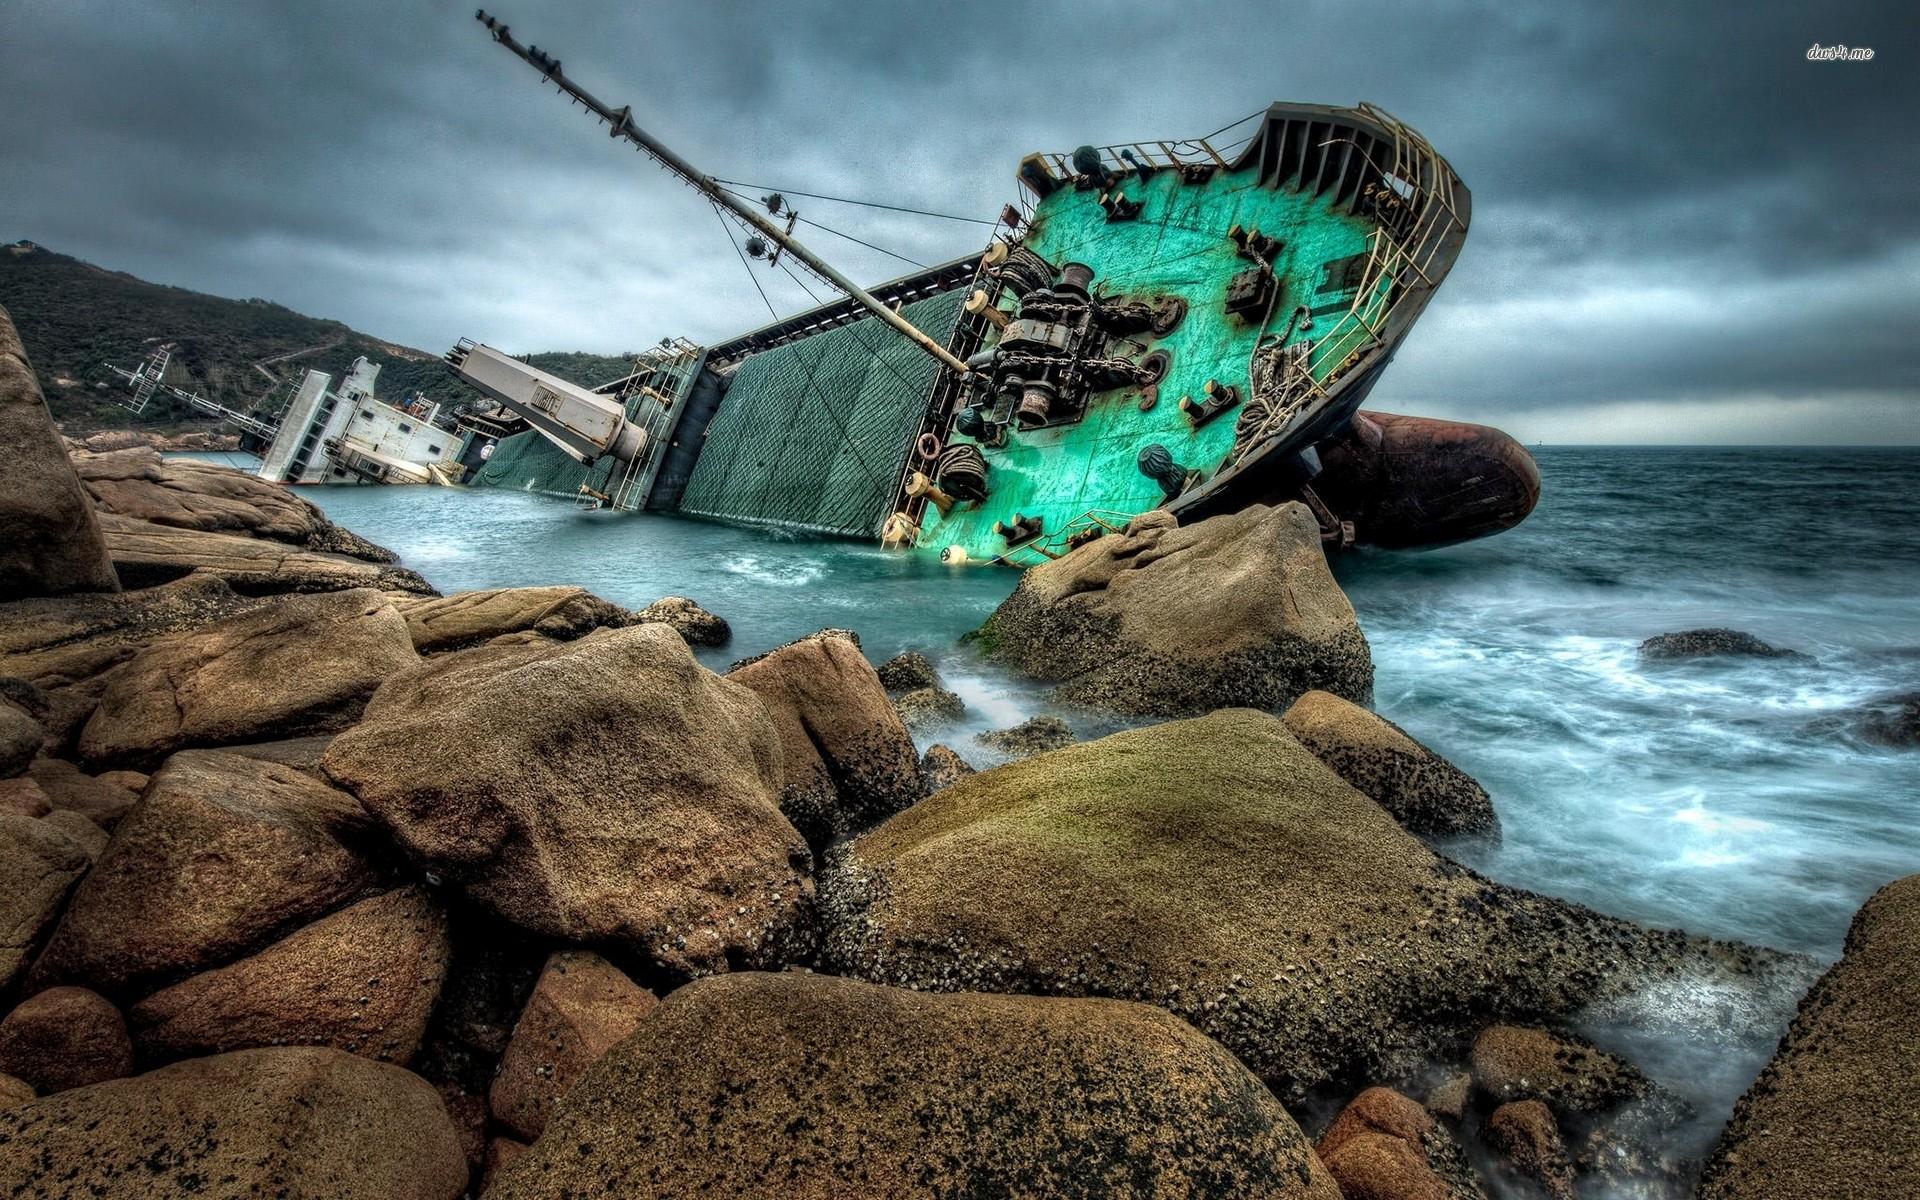 Res: 1920x1200, ... Submerged shipwreck wallpaper  ...